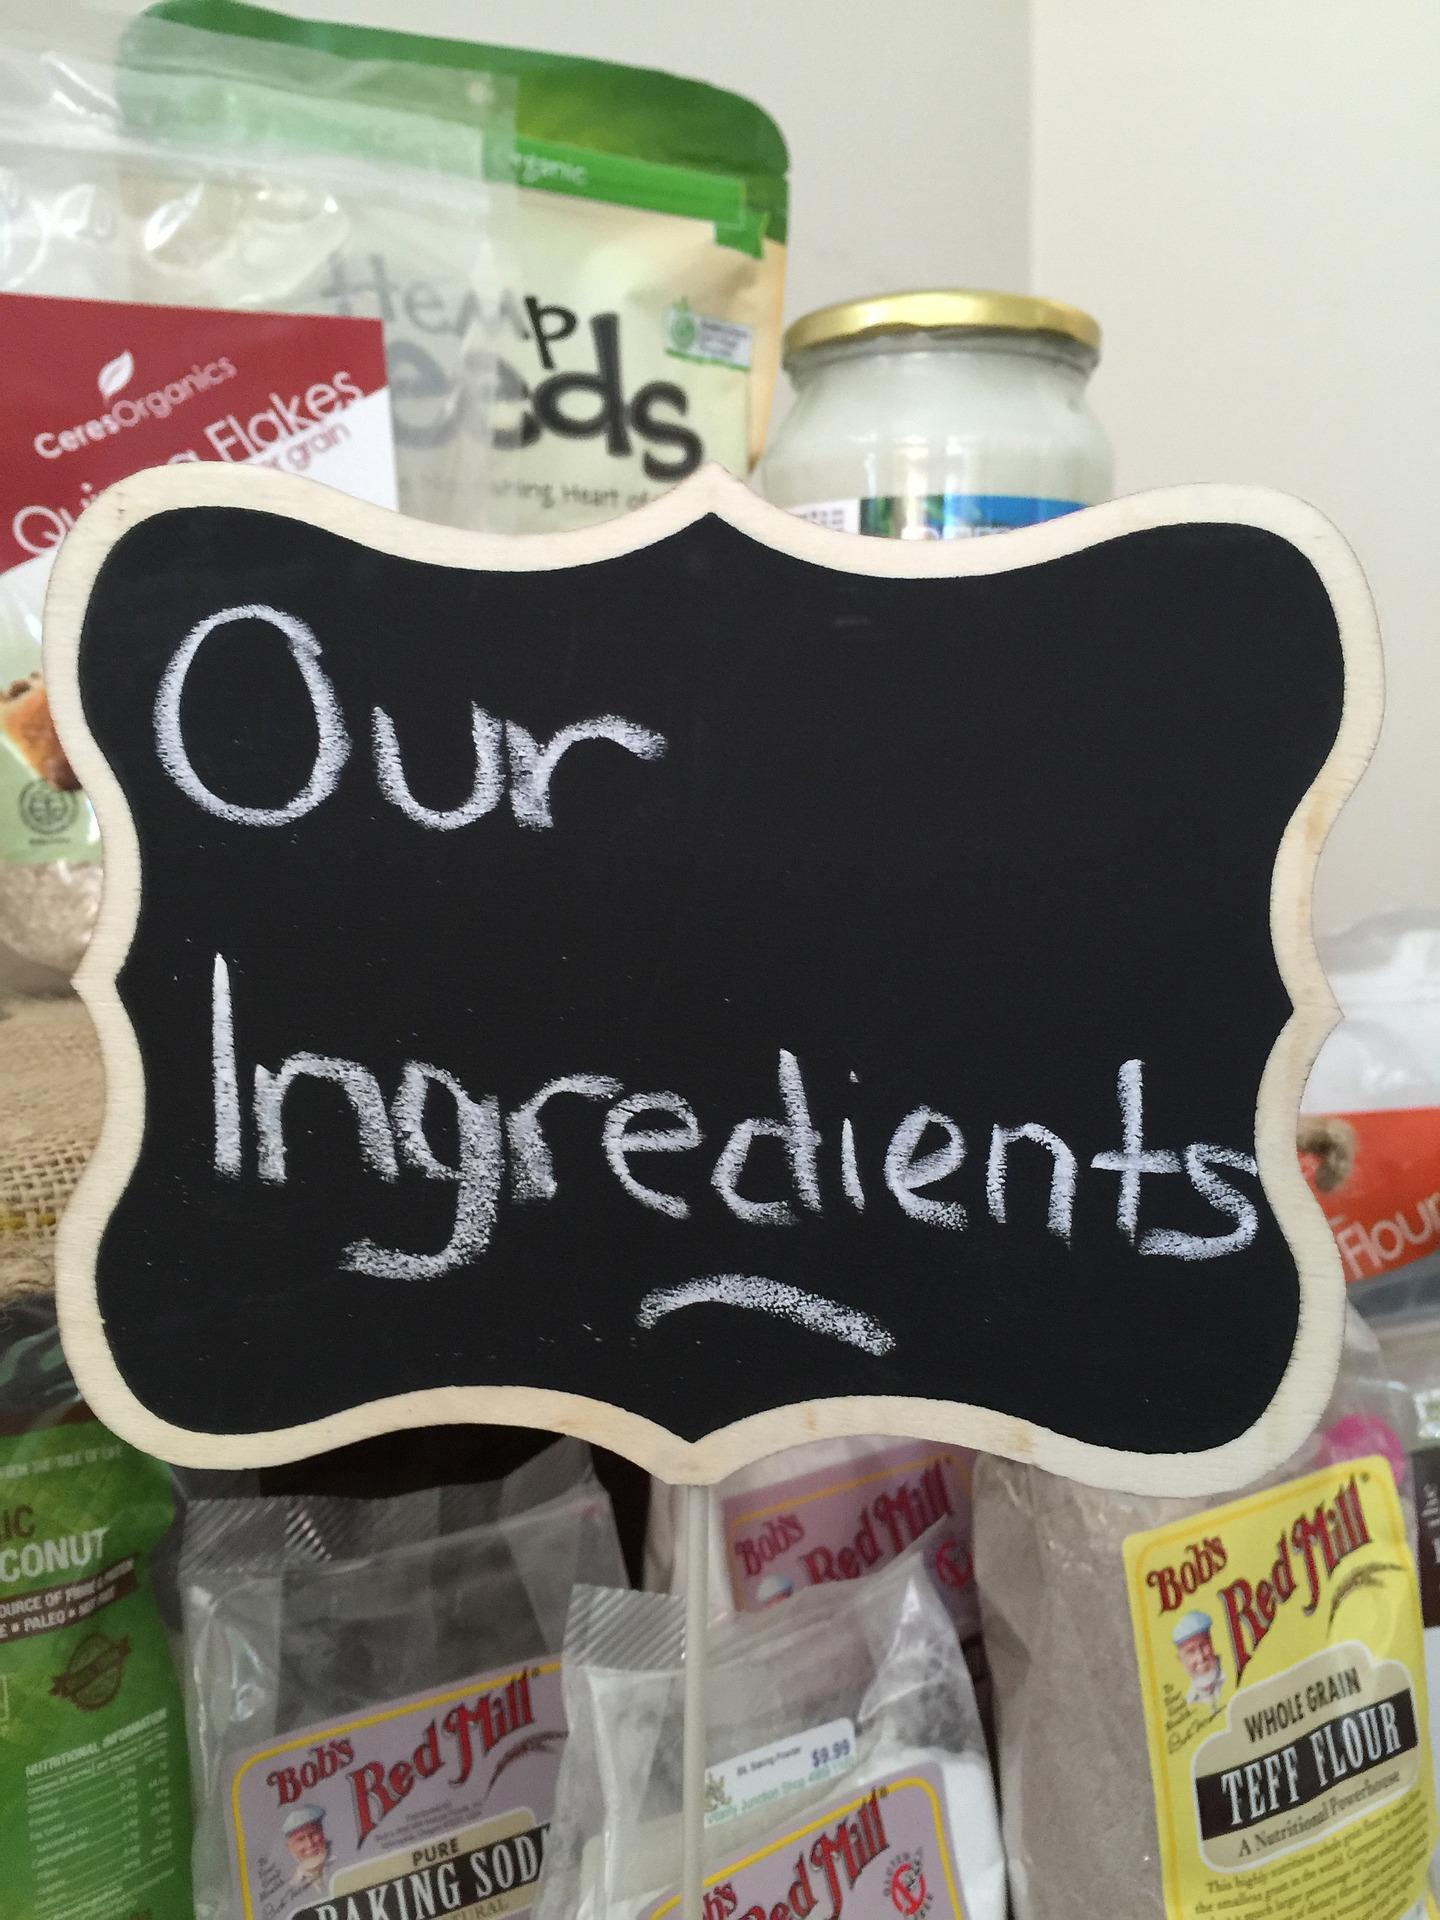 Ingredients sign